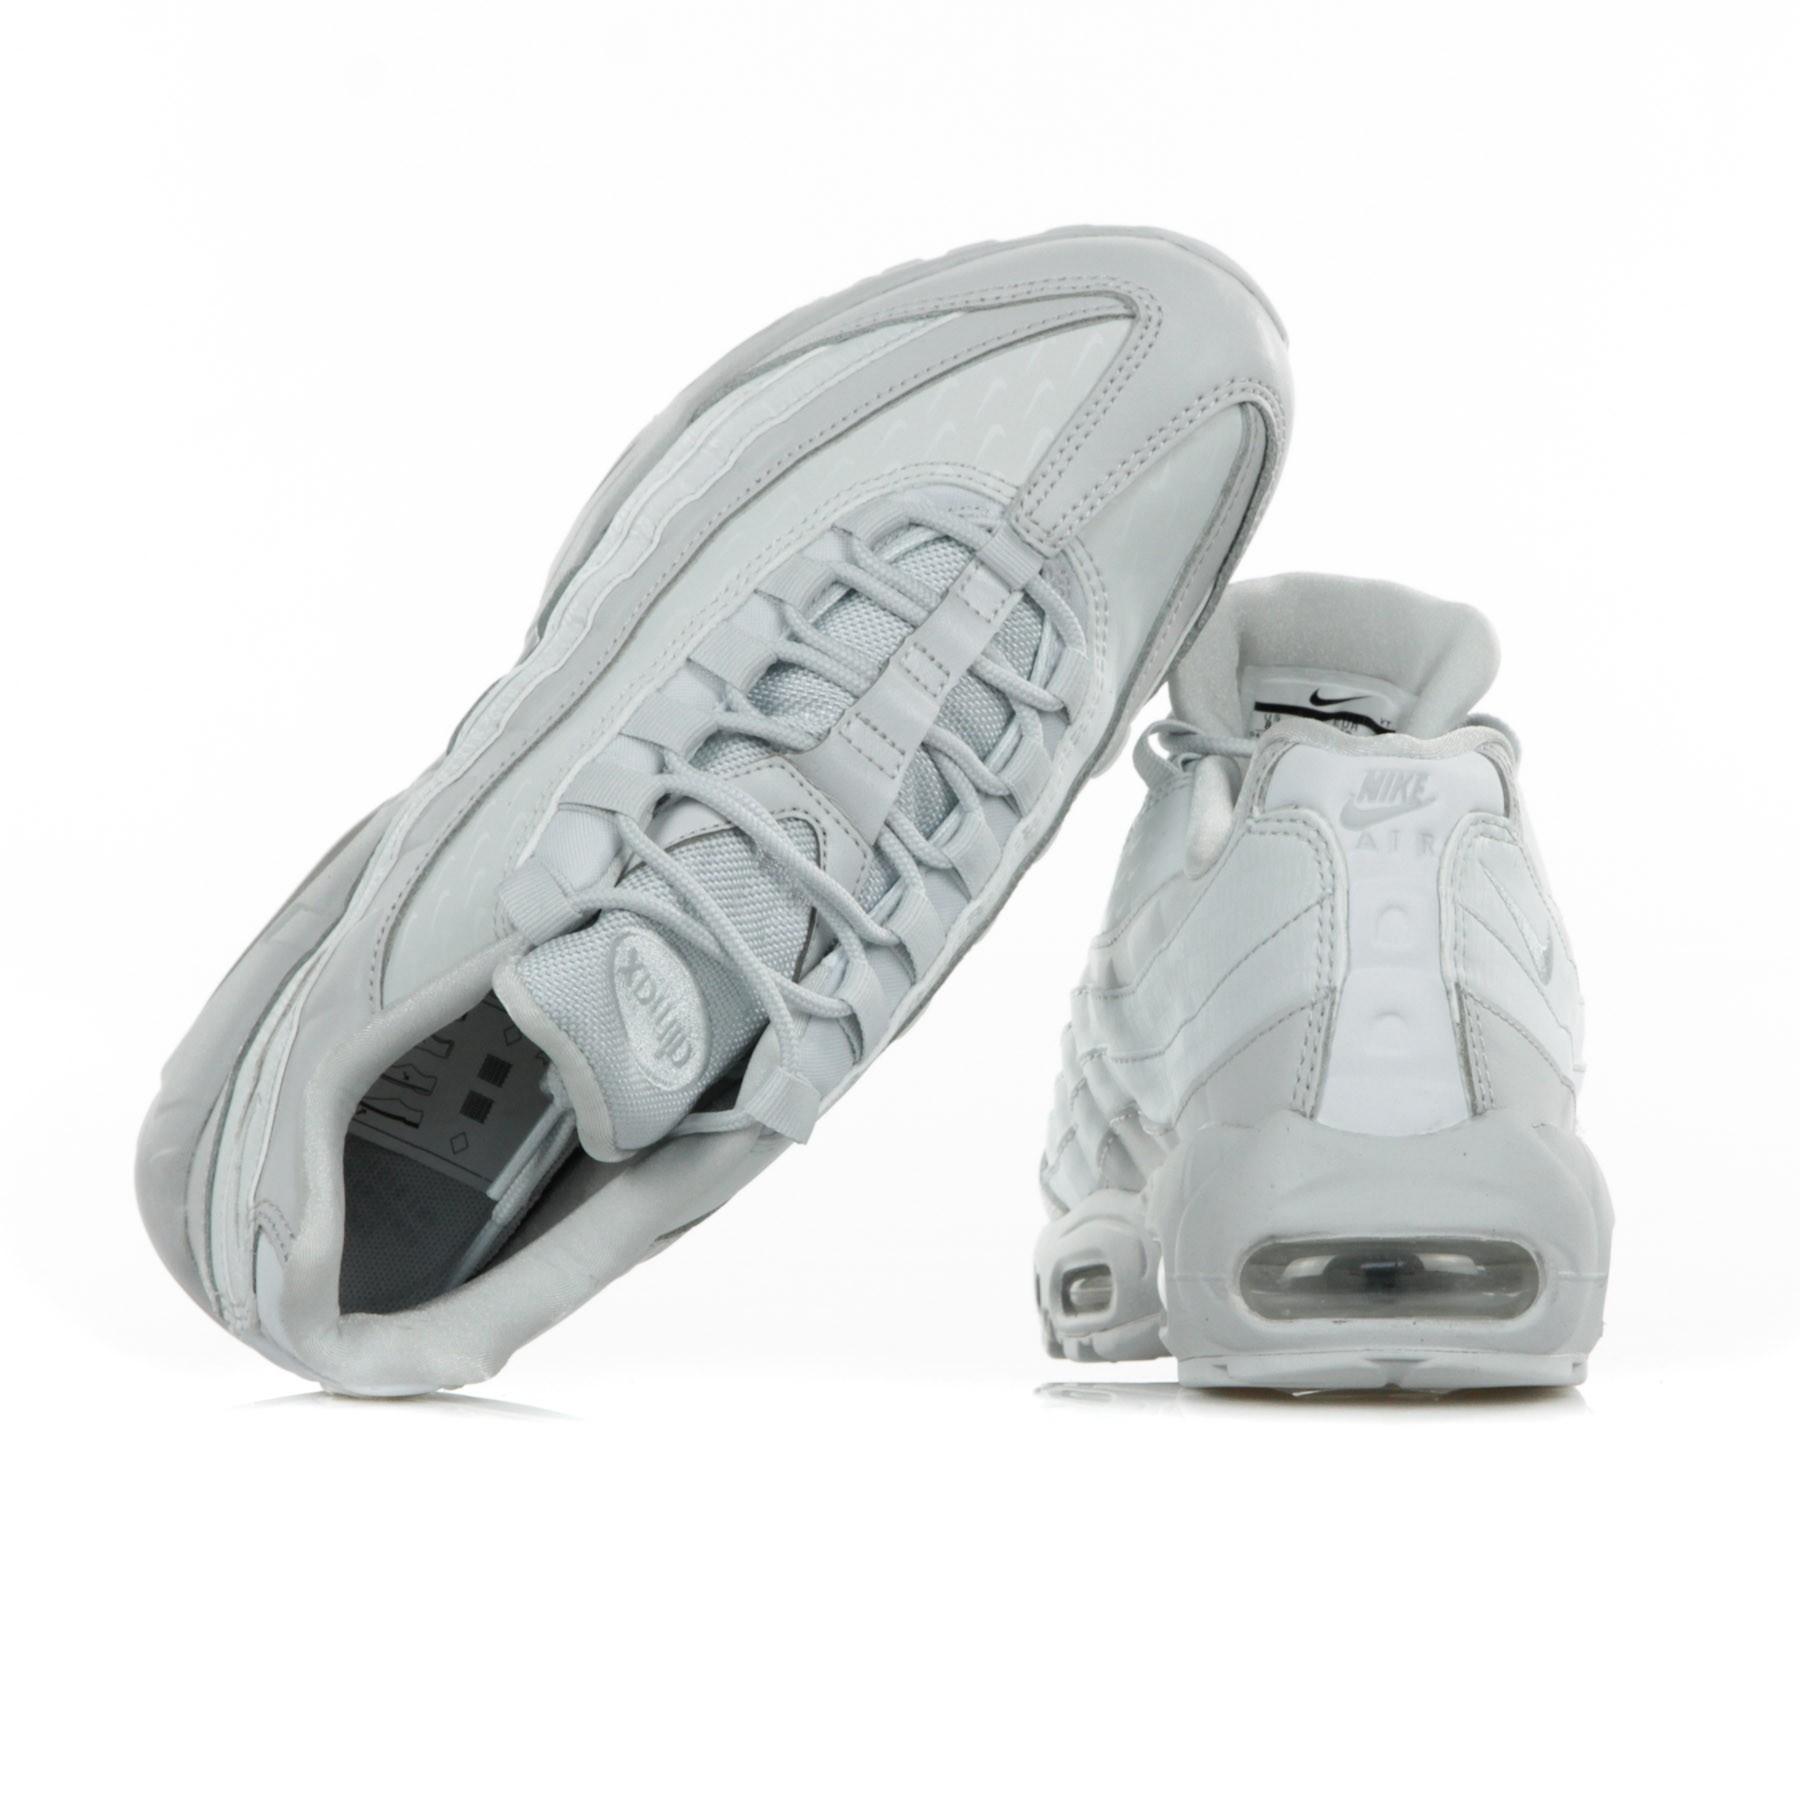 8b965833a413 scarpa-bassa-w-air-max-95-lx-pure-platinum-pure-platinum.jpg